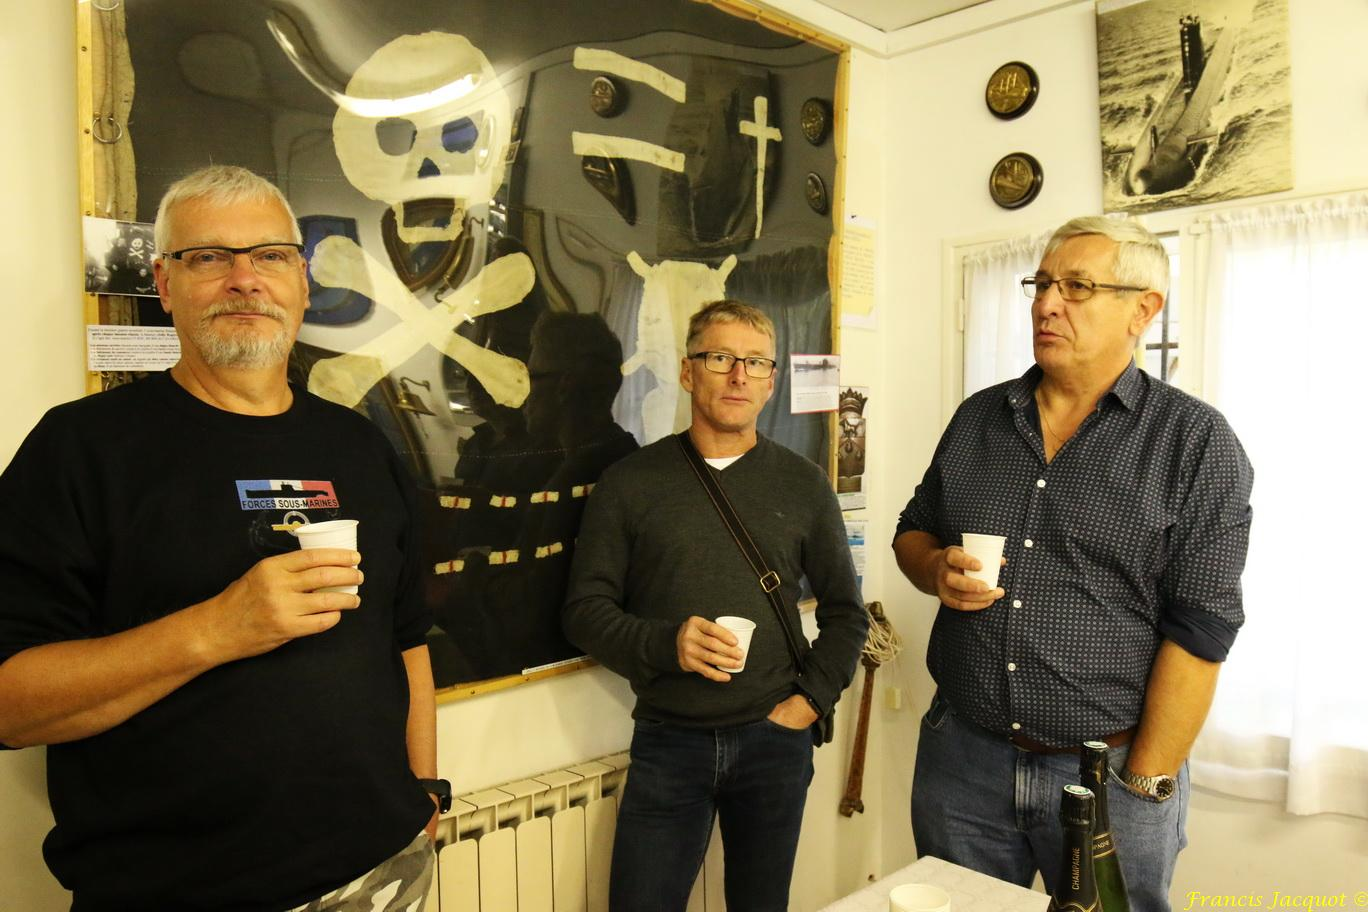 [Association anciens marins] AGASM Amicale RUBIS TOULON - Page 6 7395079722